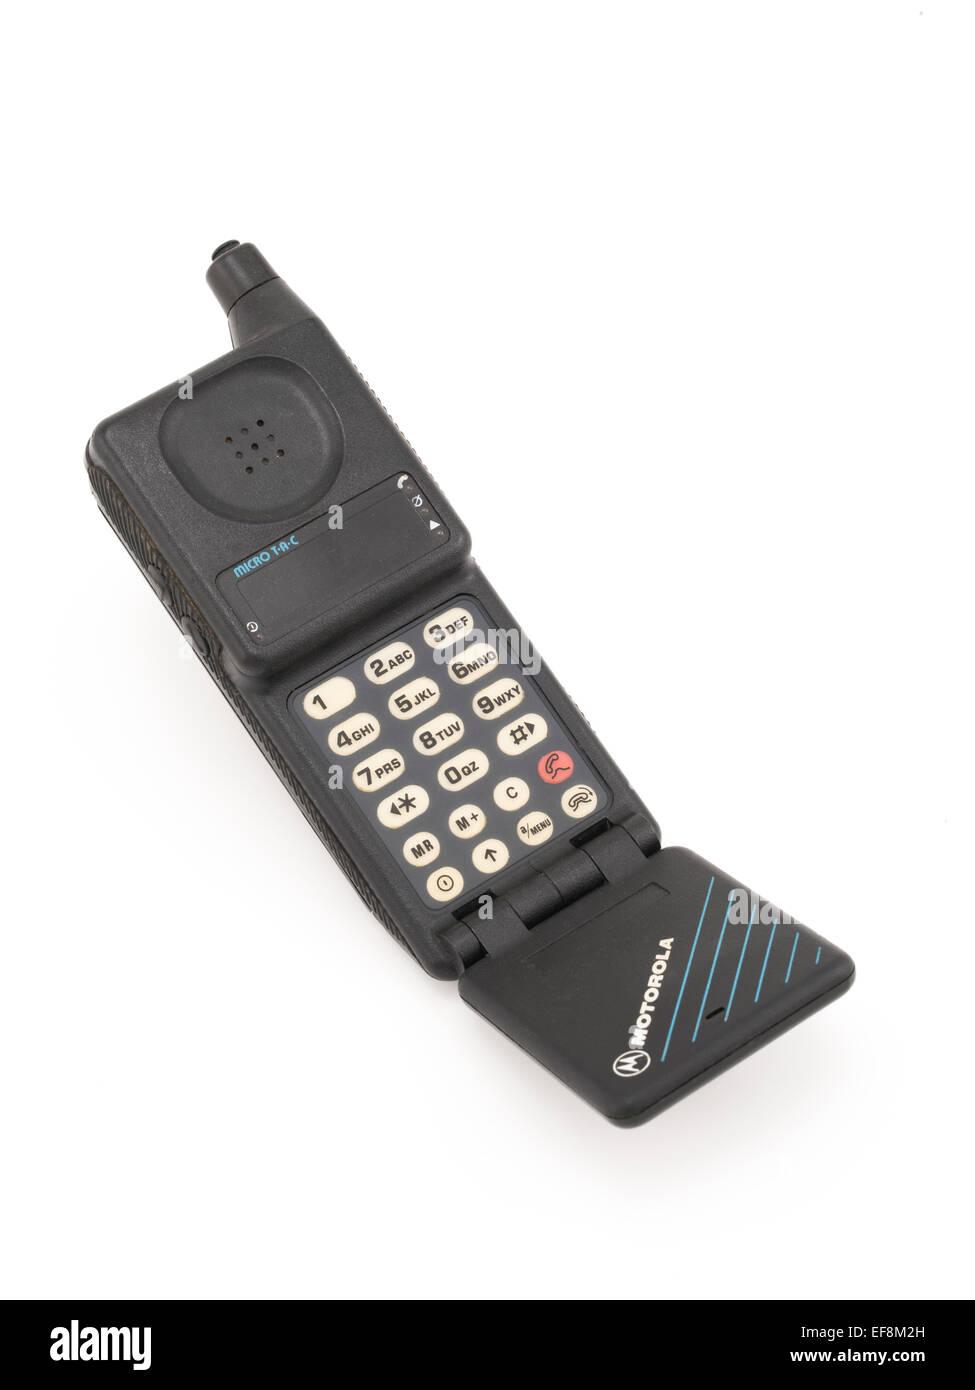 Motorola MicroTAC 9800x pocket telefono cellulare. Analog 1989 design flip phone. Immagini Stock